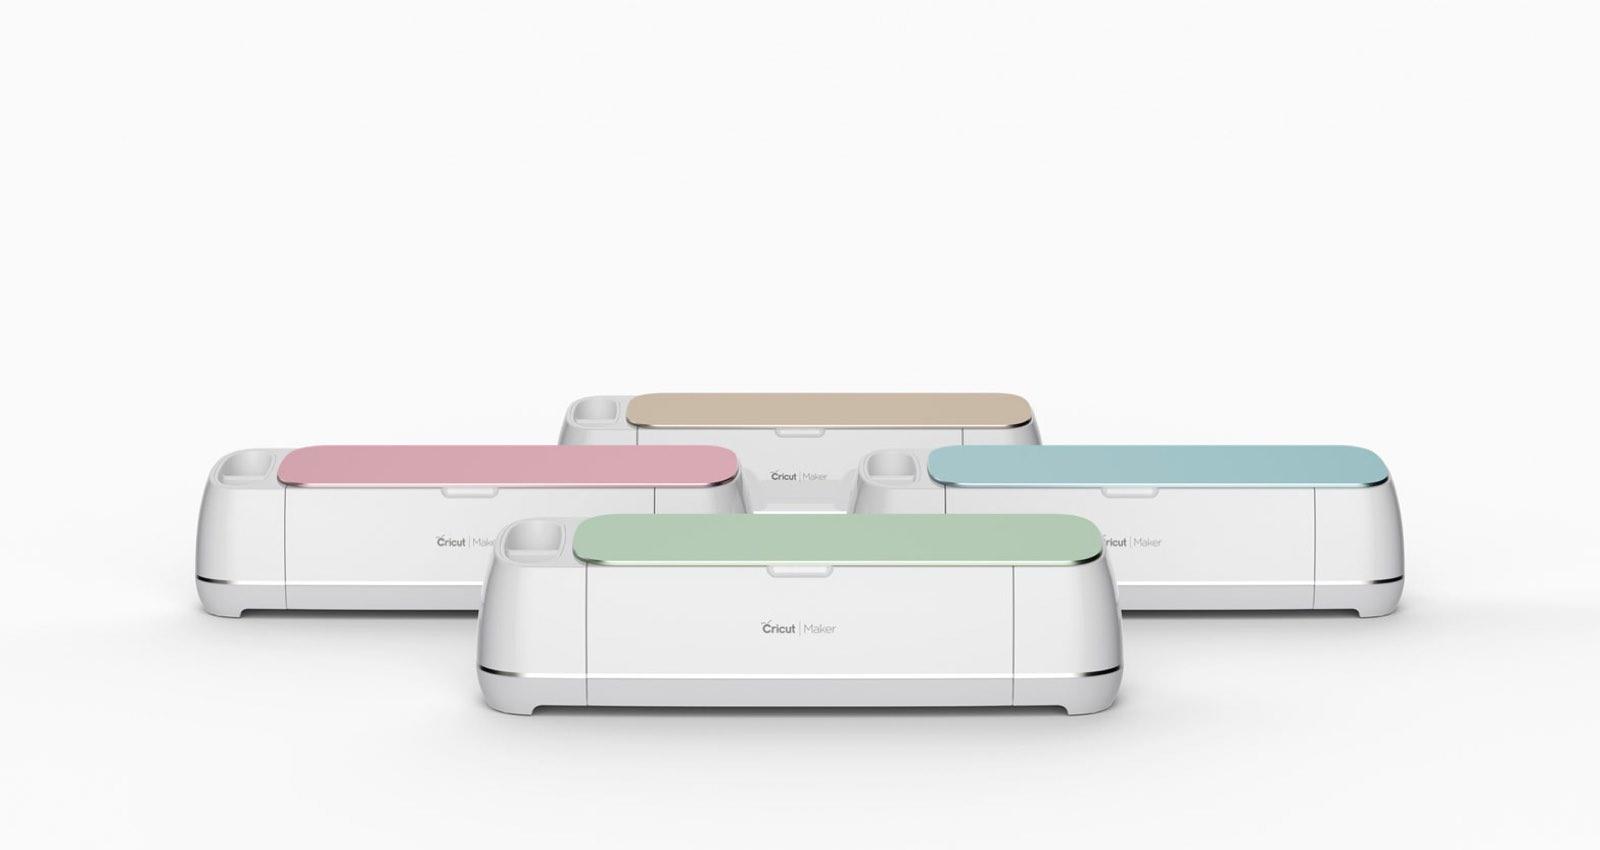 Cricut Maker in 4 Colors